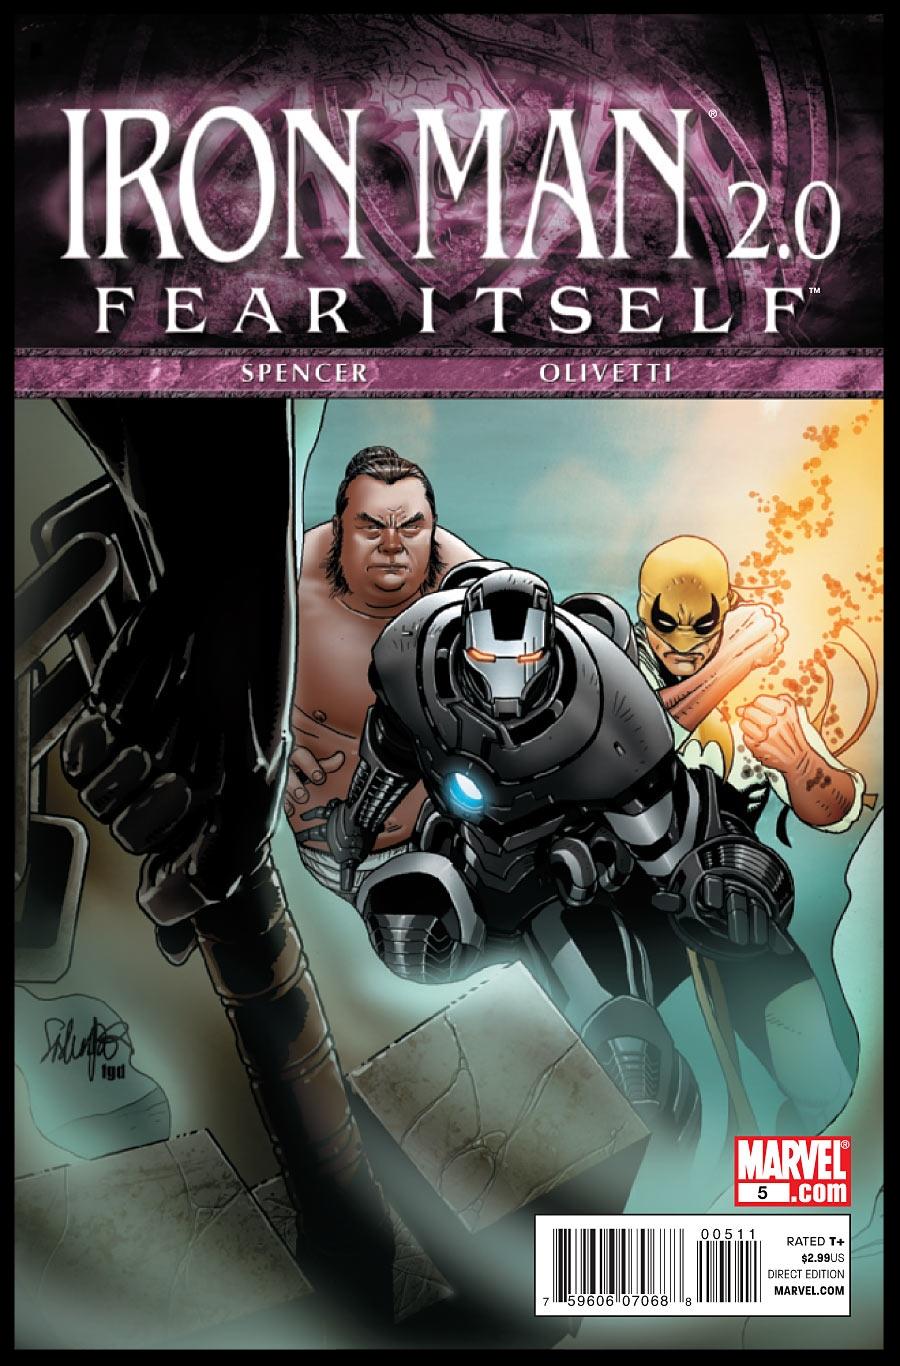 Iron Man 2.0 #5 Cover